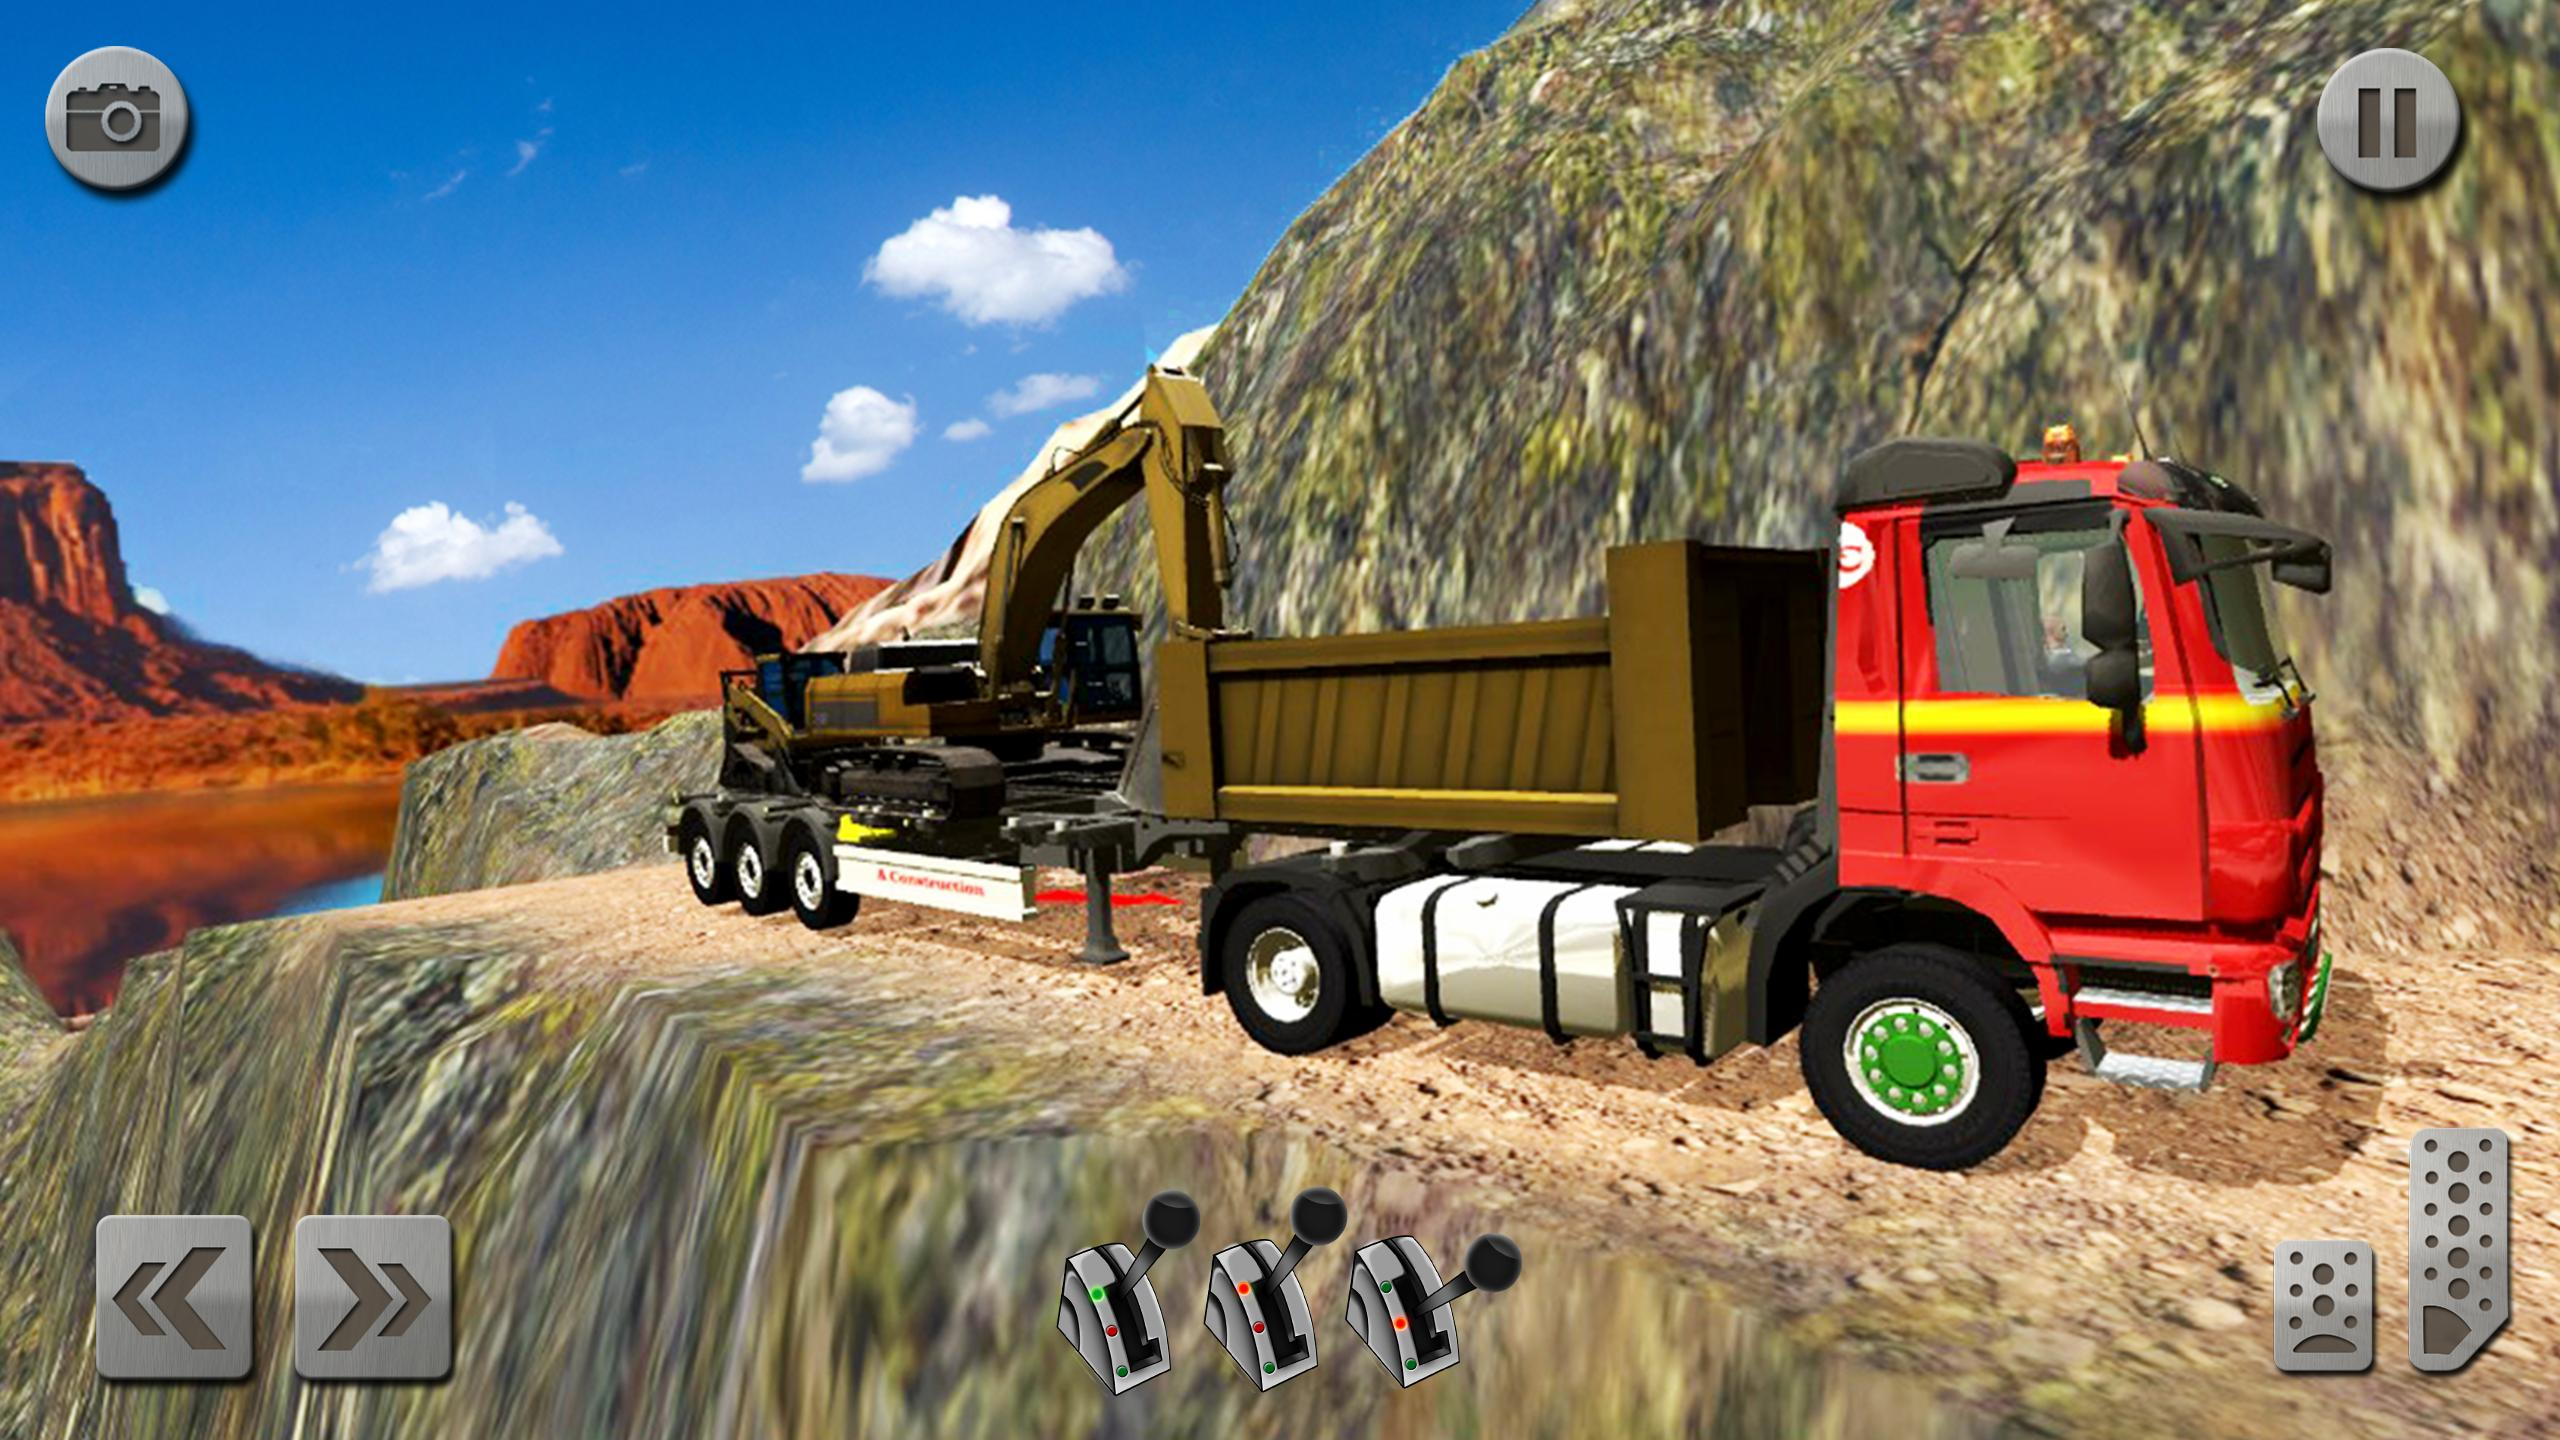 Sand Excavator Truck Driving Rescue Simulator game 5.2 Screenshot 13